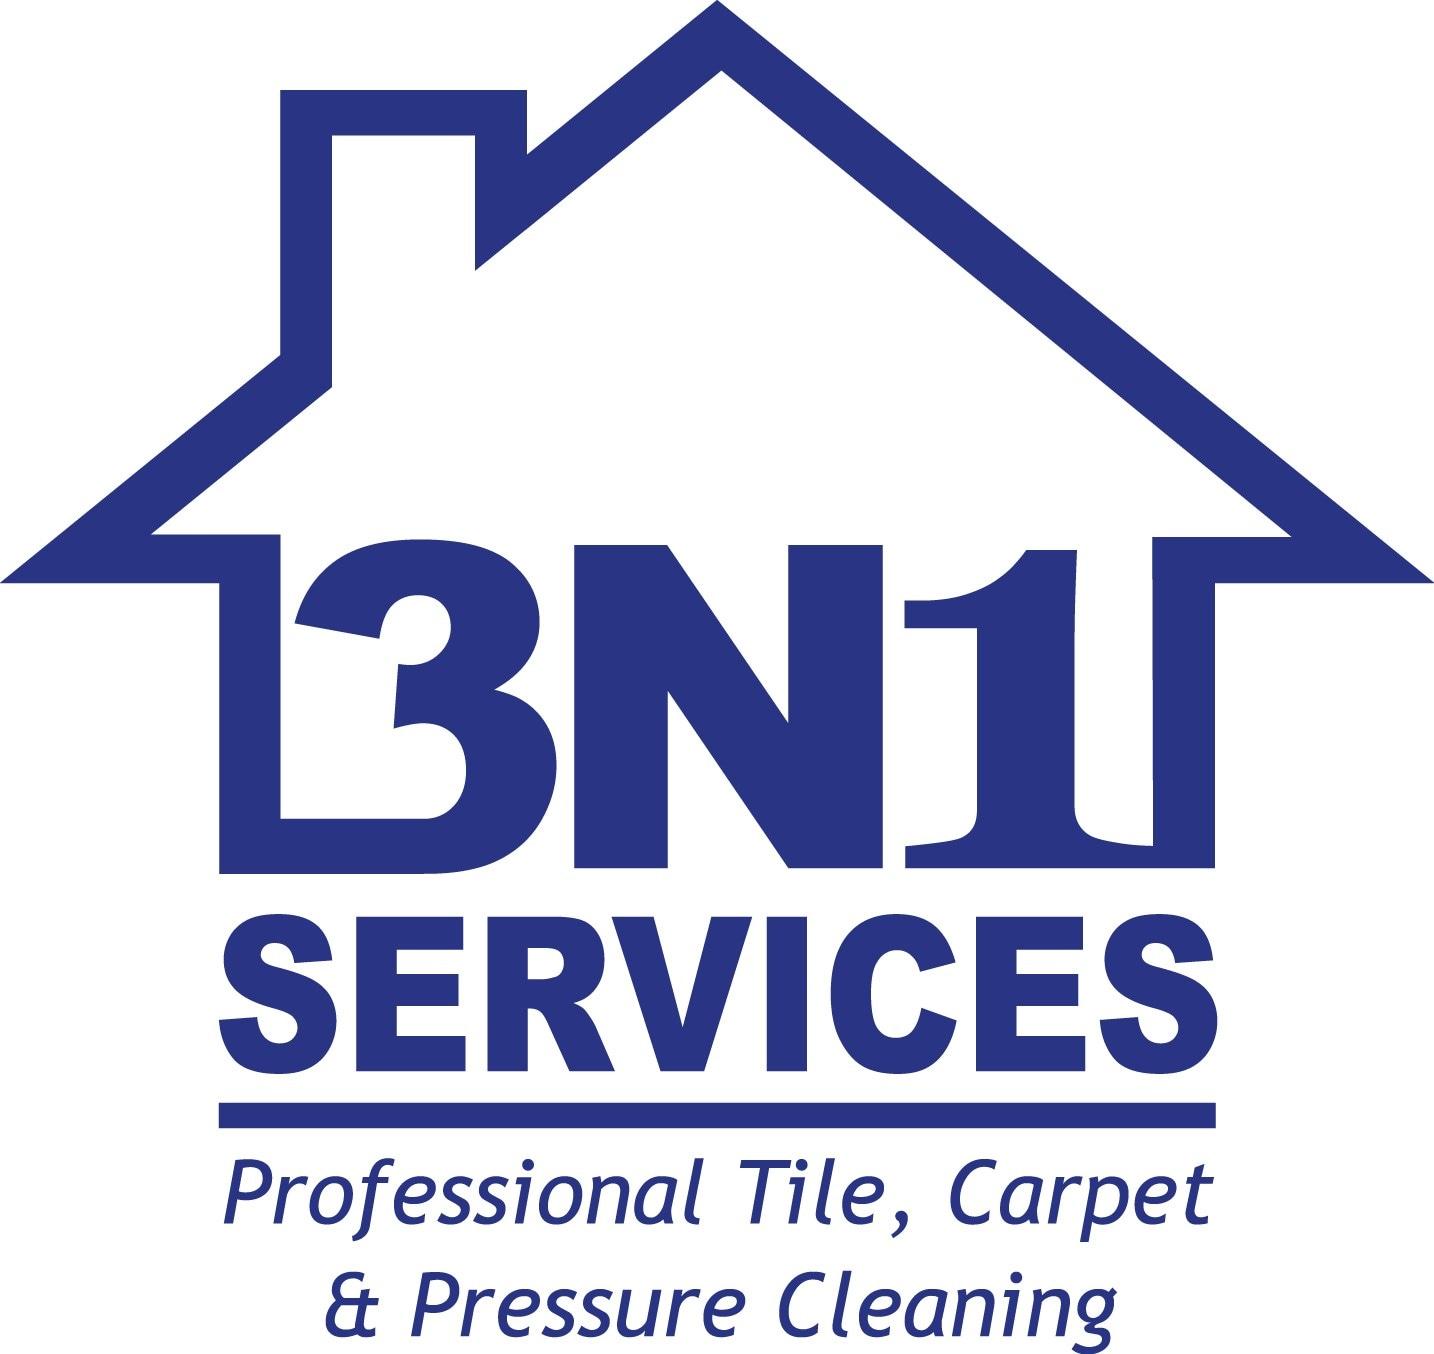 3N1 Services logo